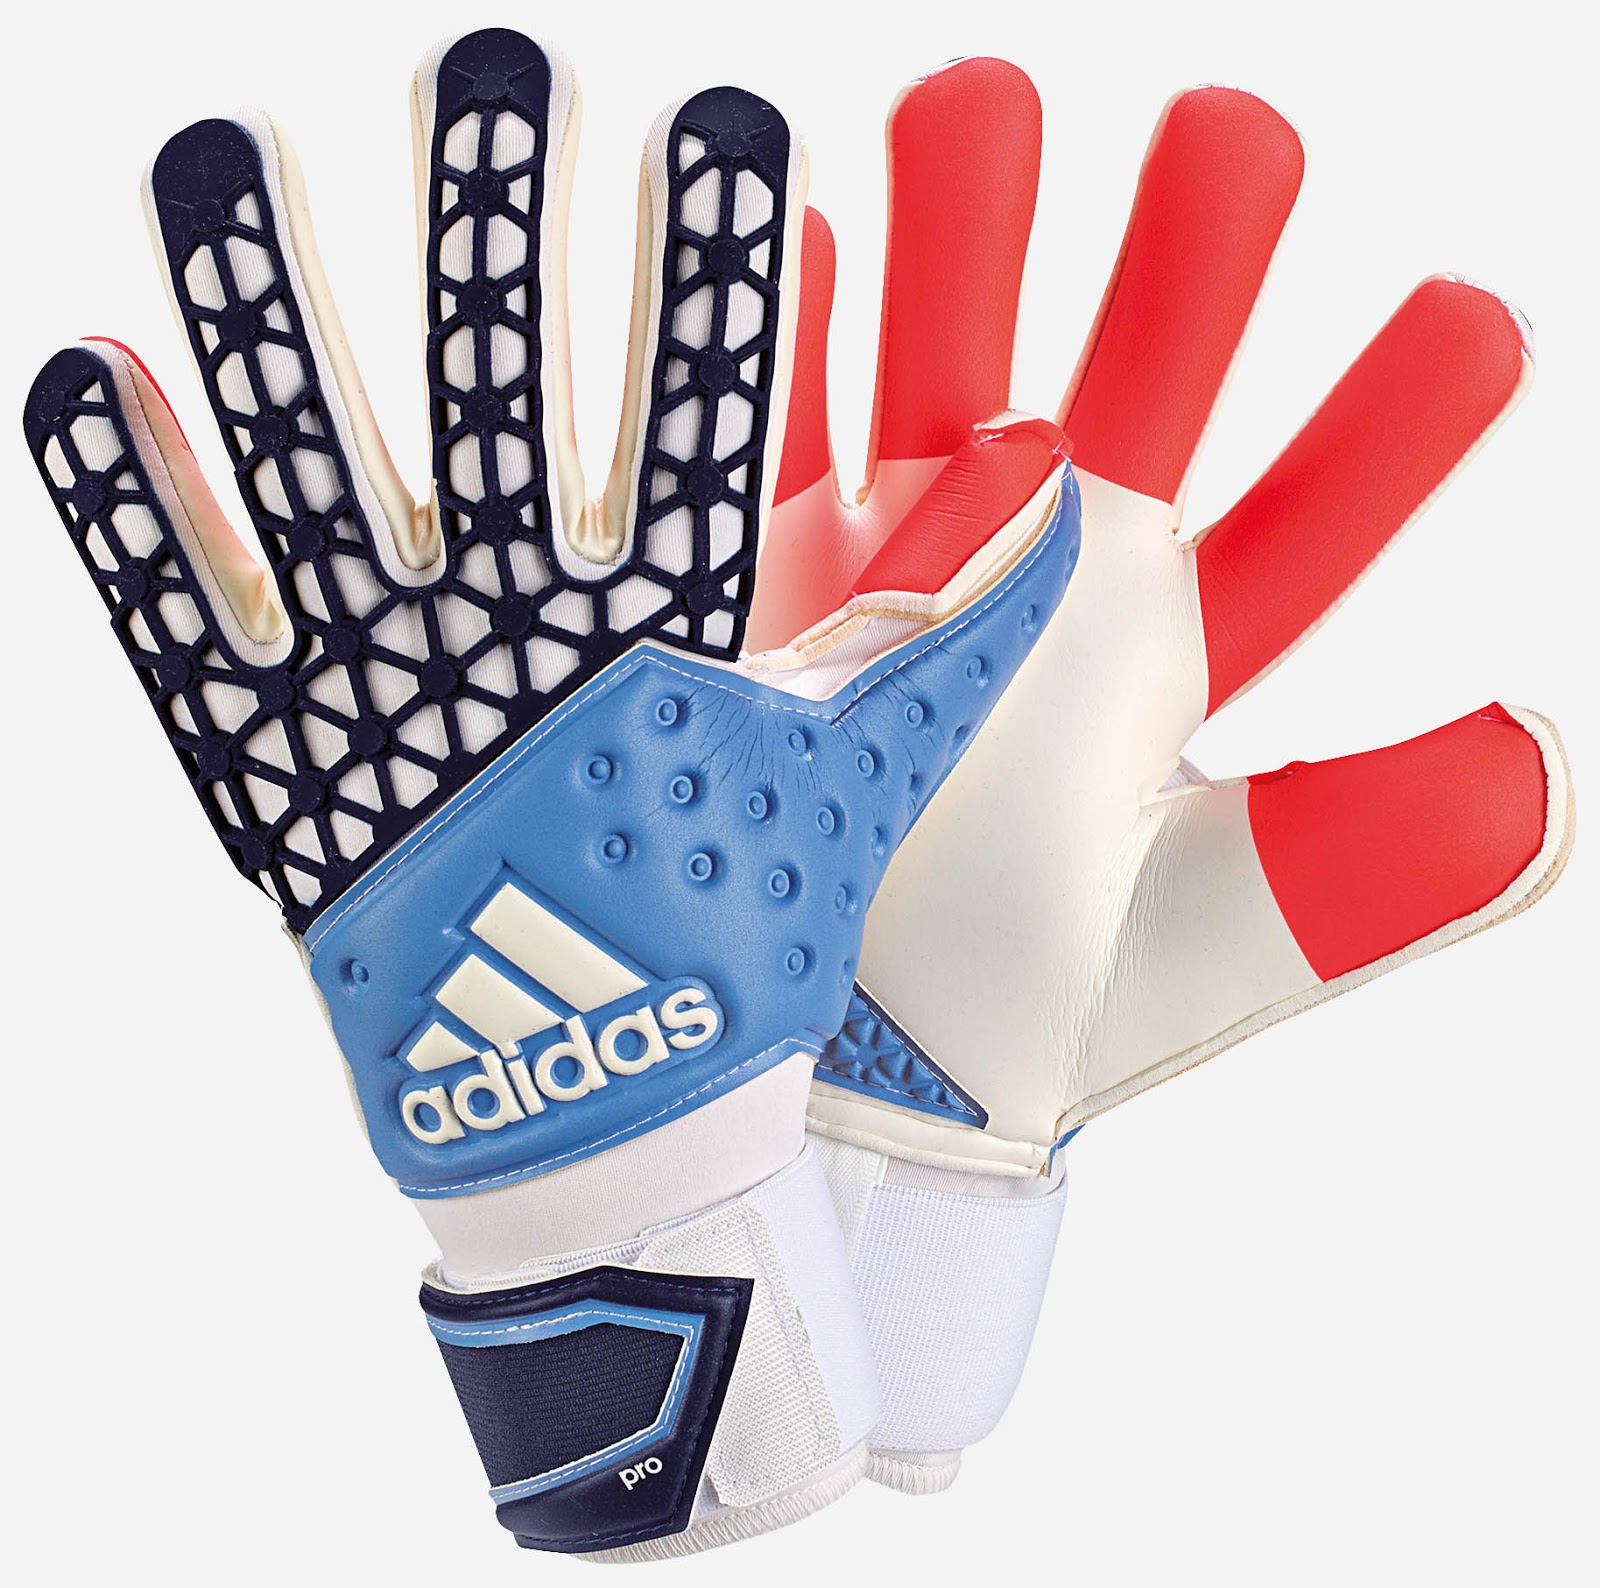 Photos Adidas Ace Zones Pro Iker Casillas Gloves |Goalkeeper Gloves Adidas 2015